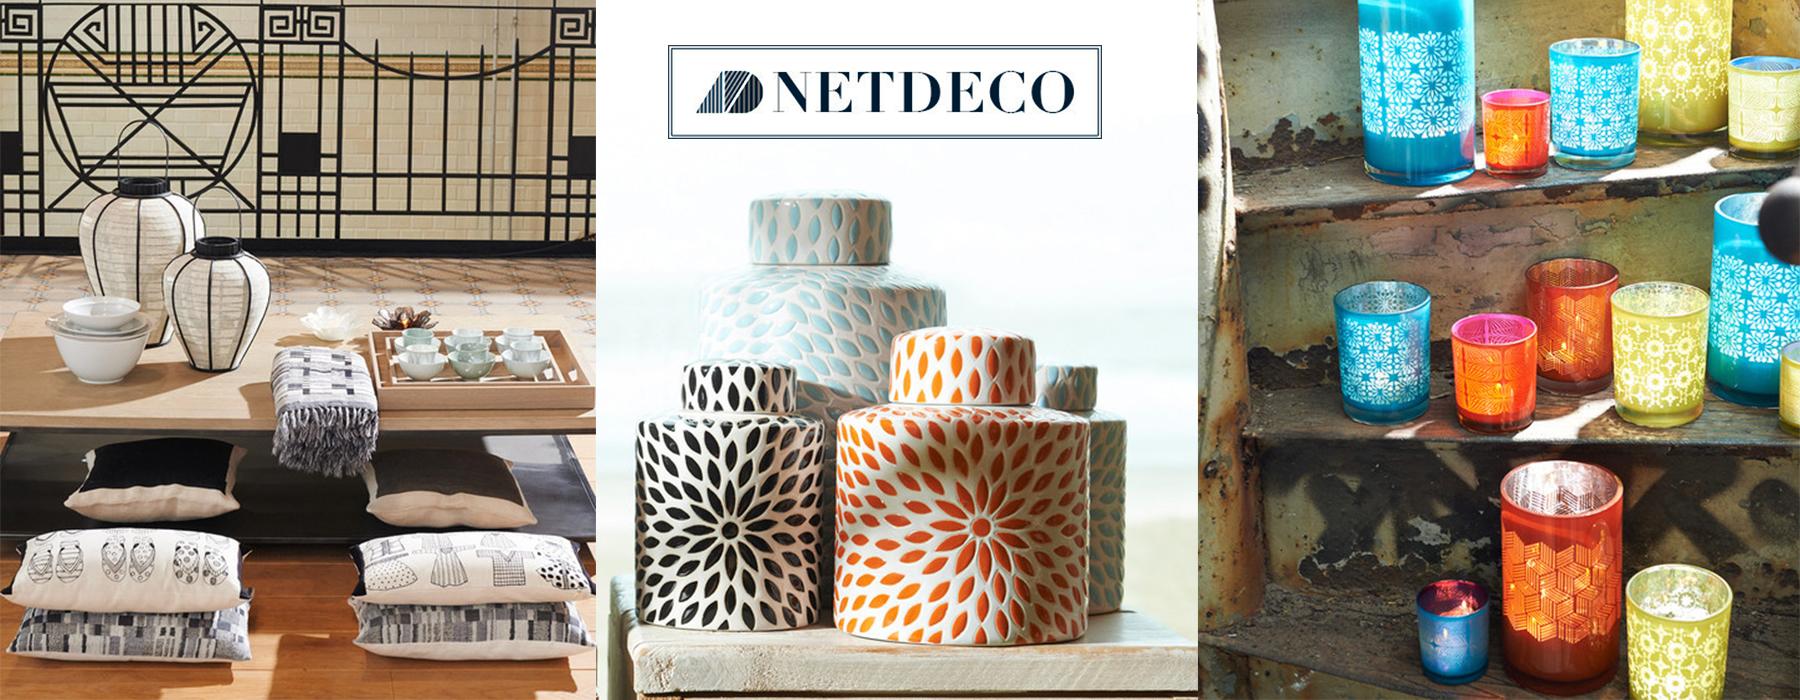 banner-portfolio-Netdecol